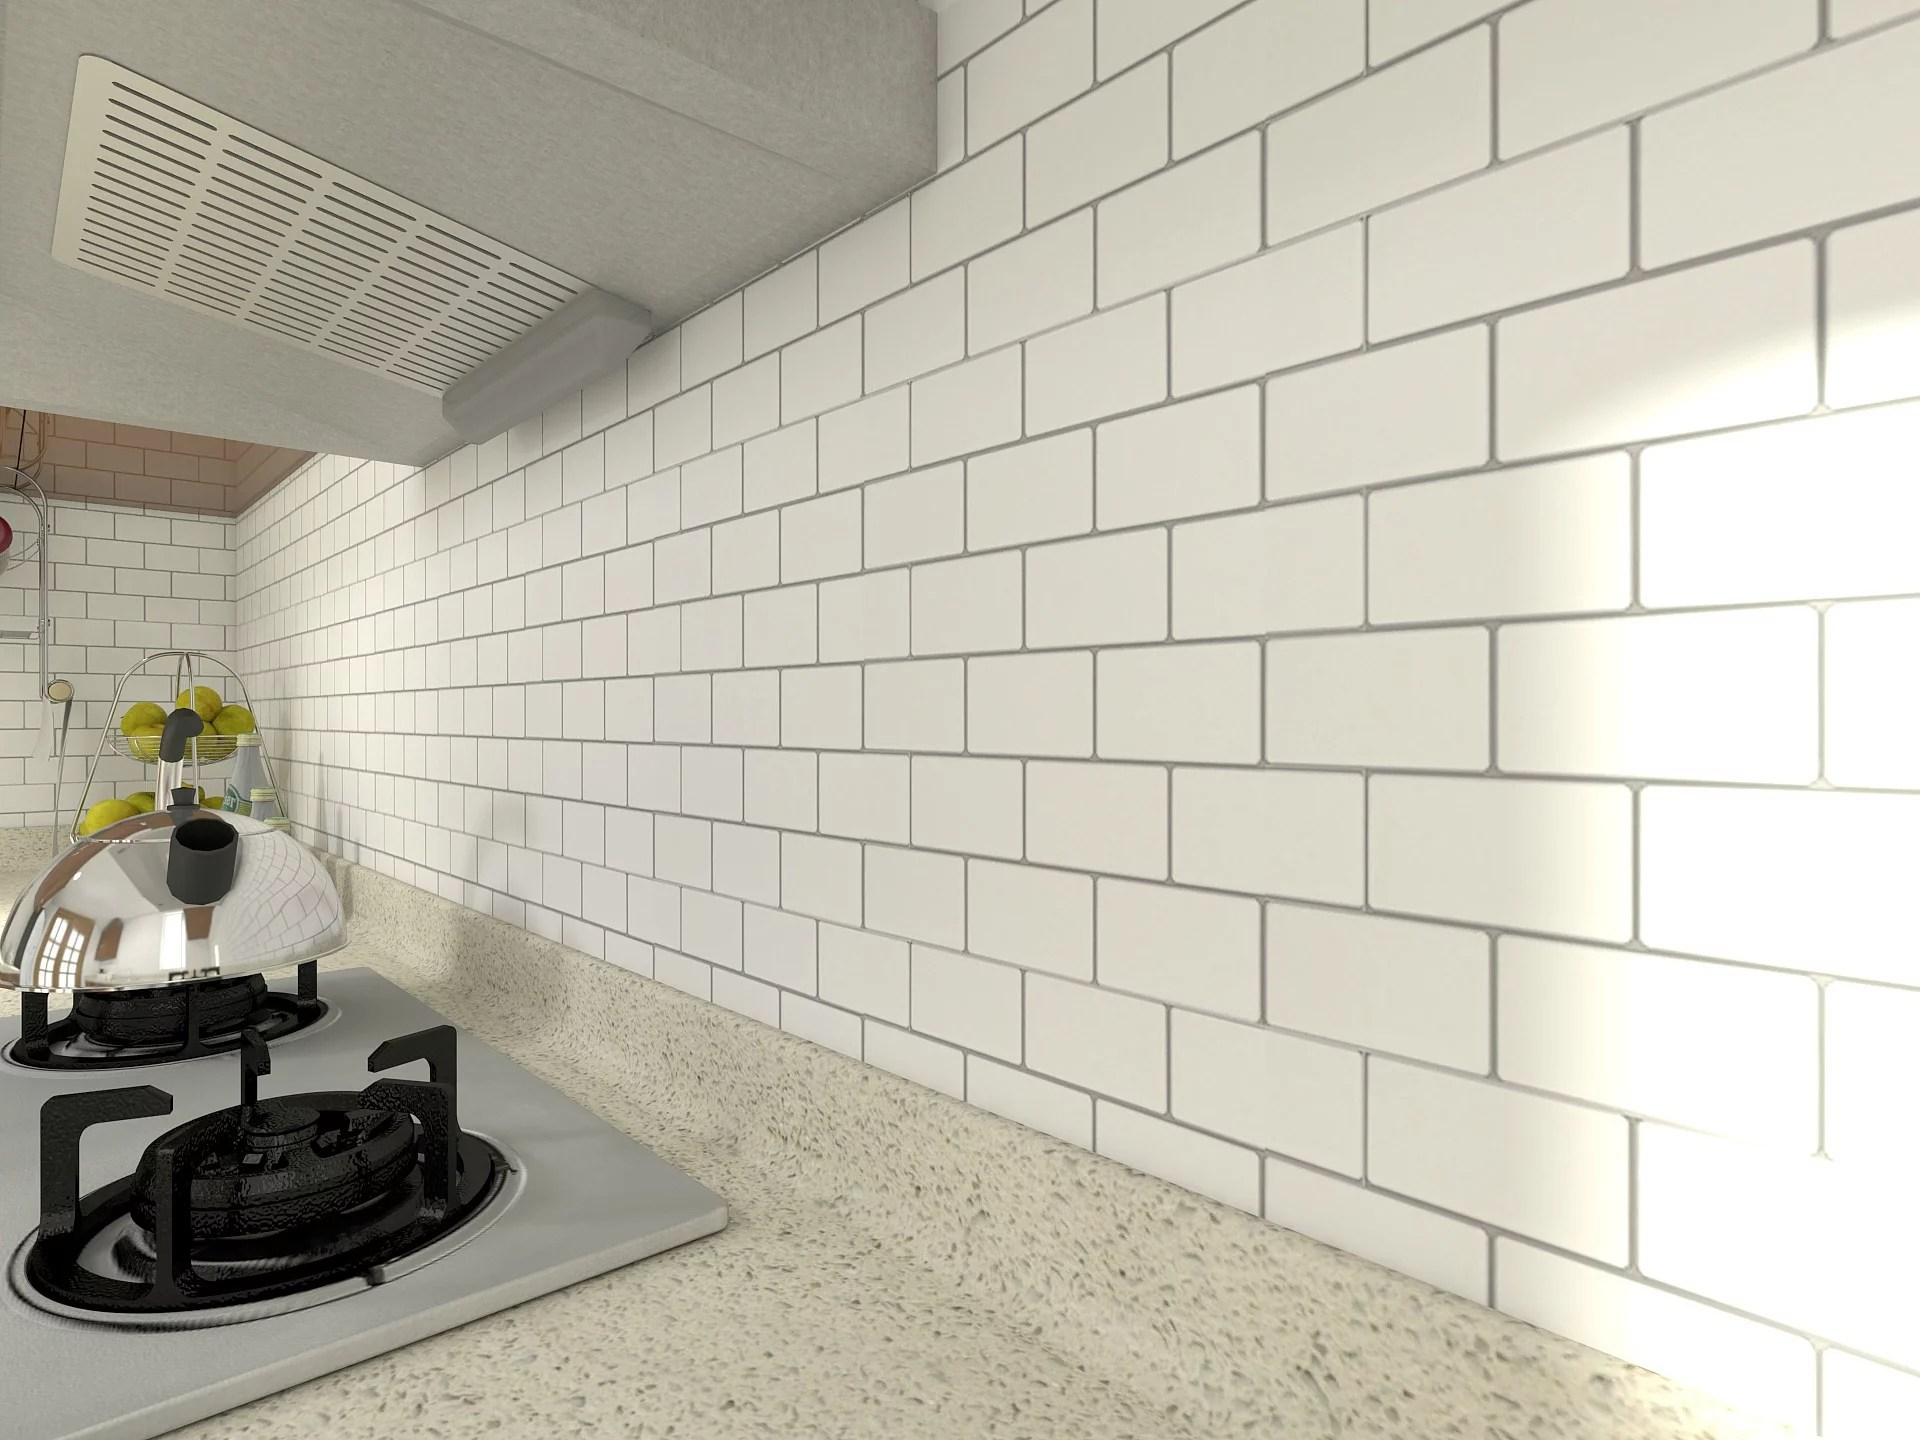 long king tile peel and stick backsplash tile premium anti mold tile for kitchen in white subway tile 12 x12 10 pack